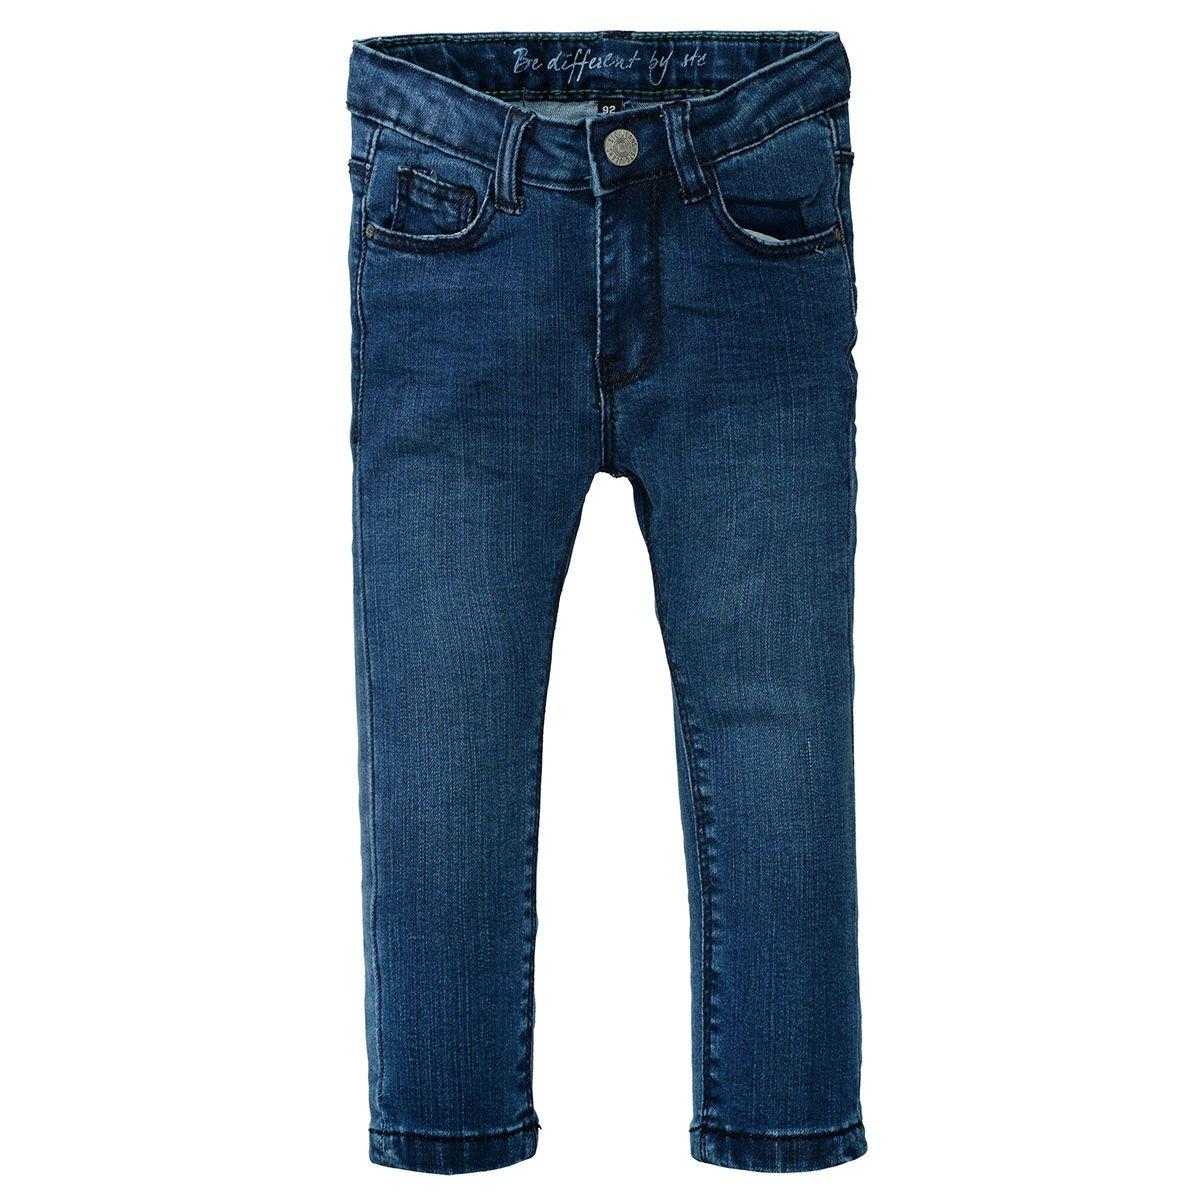 ORGANIC COTTON Skinny Jeans Slim Fit - Mid Blue Denim